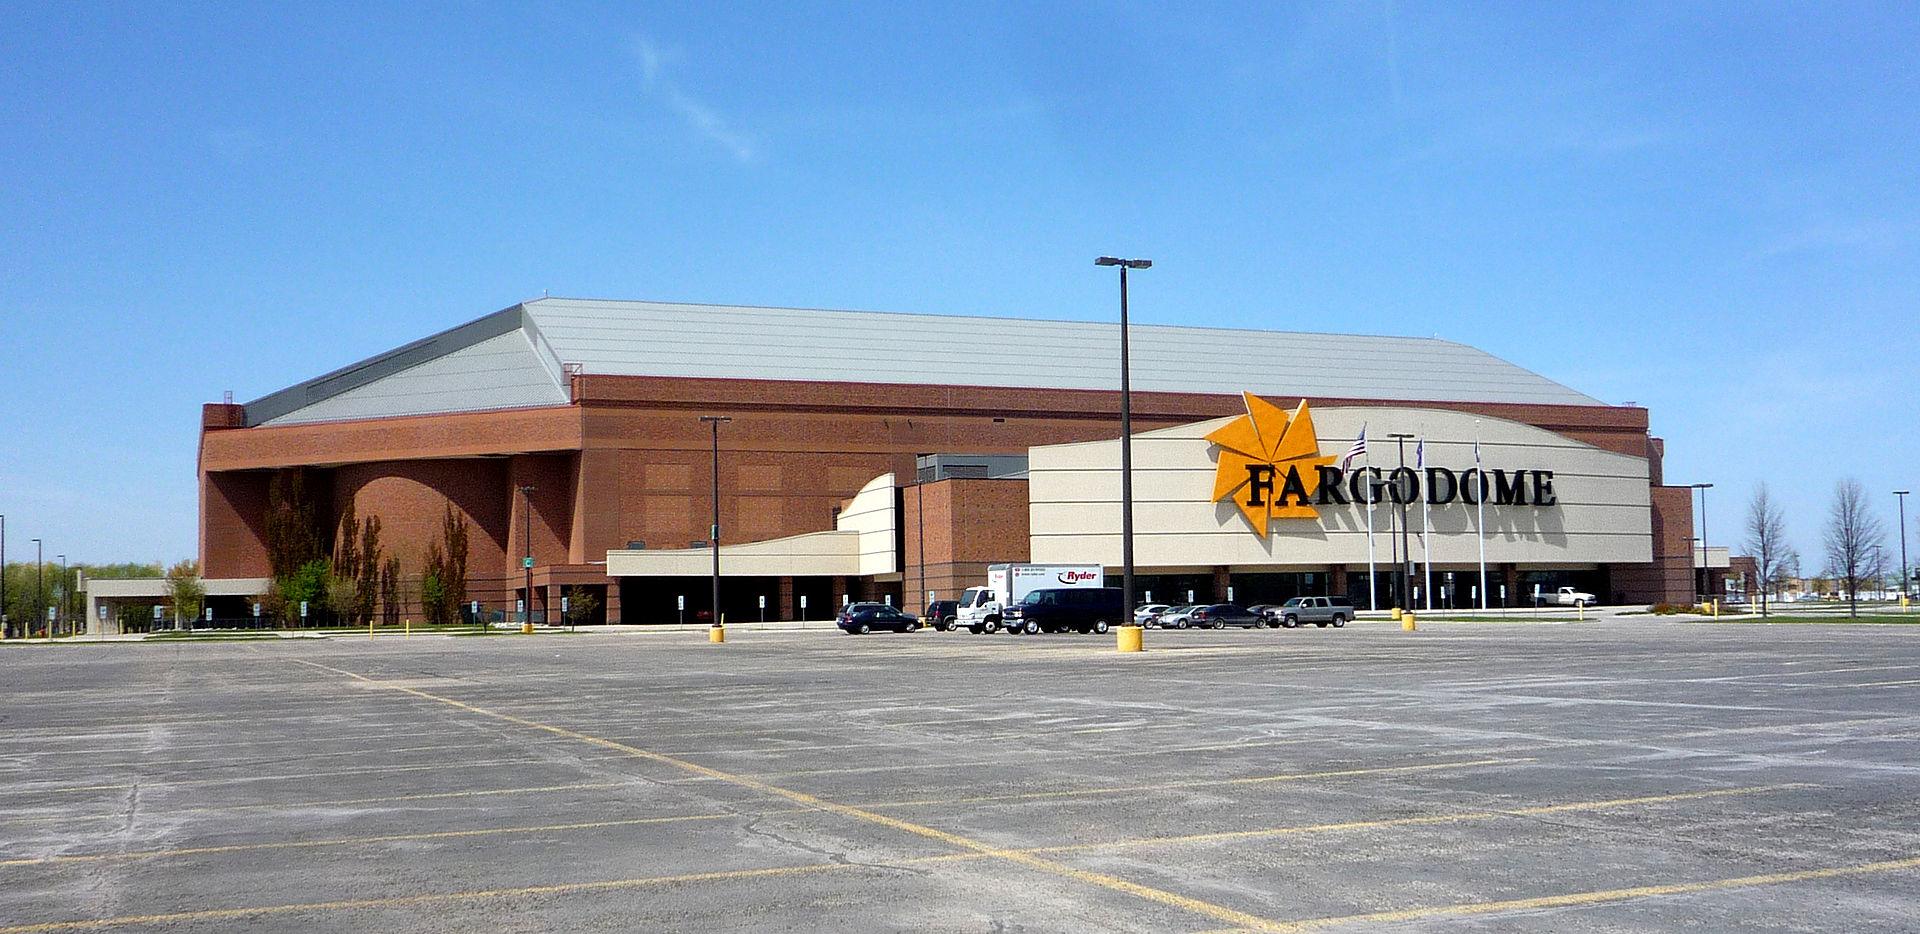 [Image: 1920px-2009-0518-Fargodome.jpg]